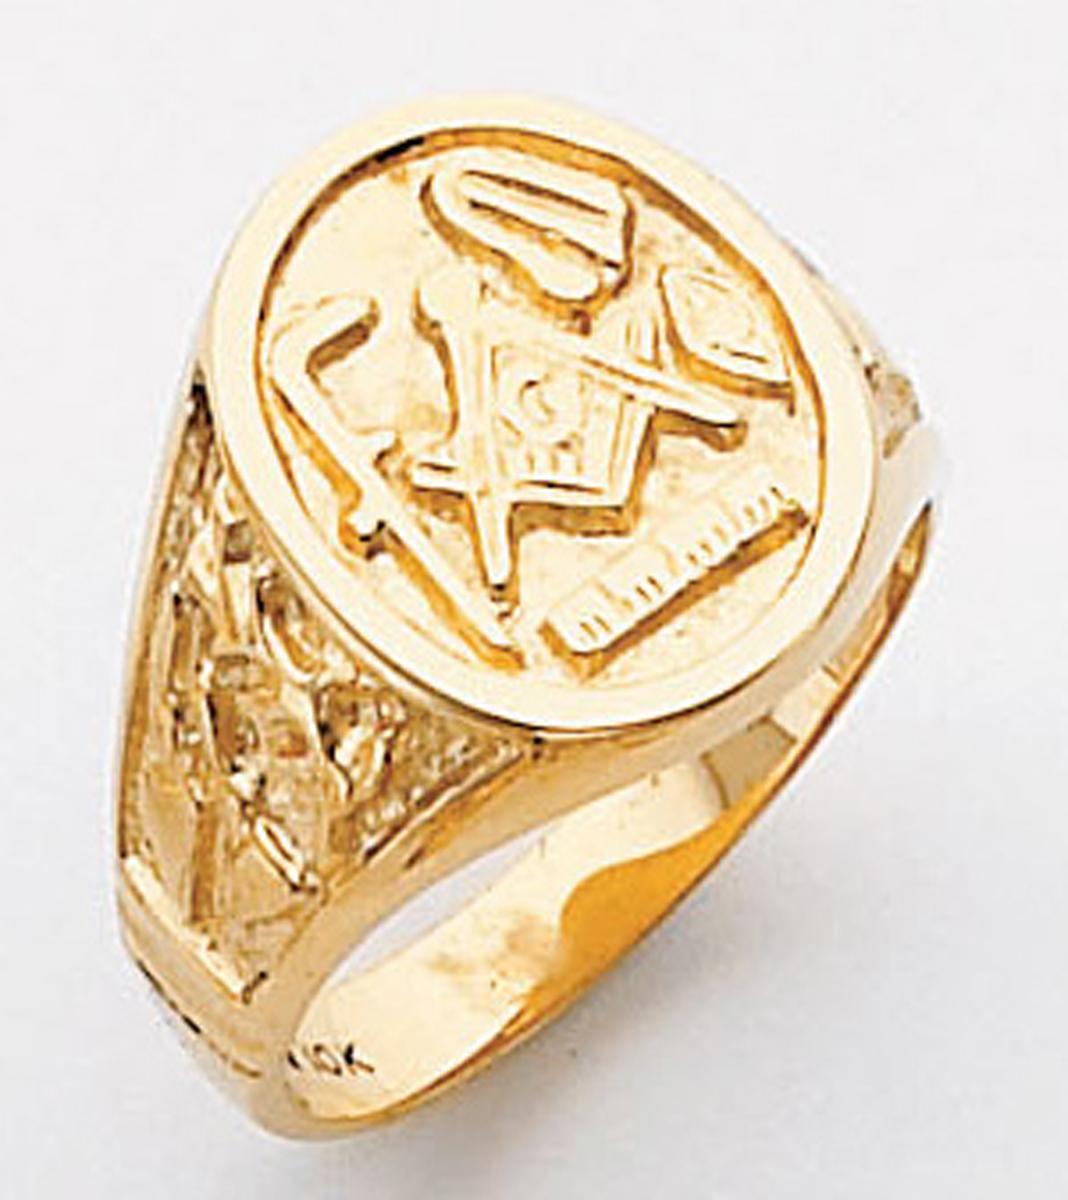 Gold Masonic Ring - 5116 - Solid Back